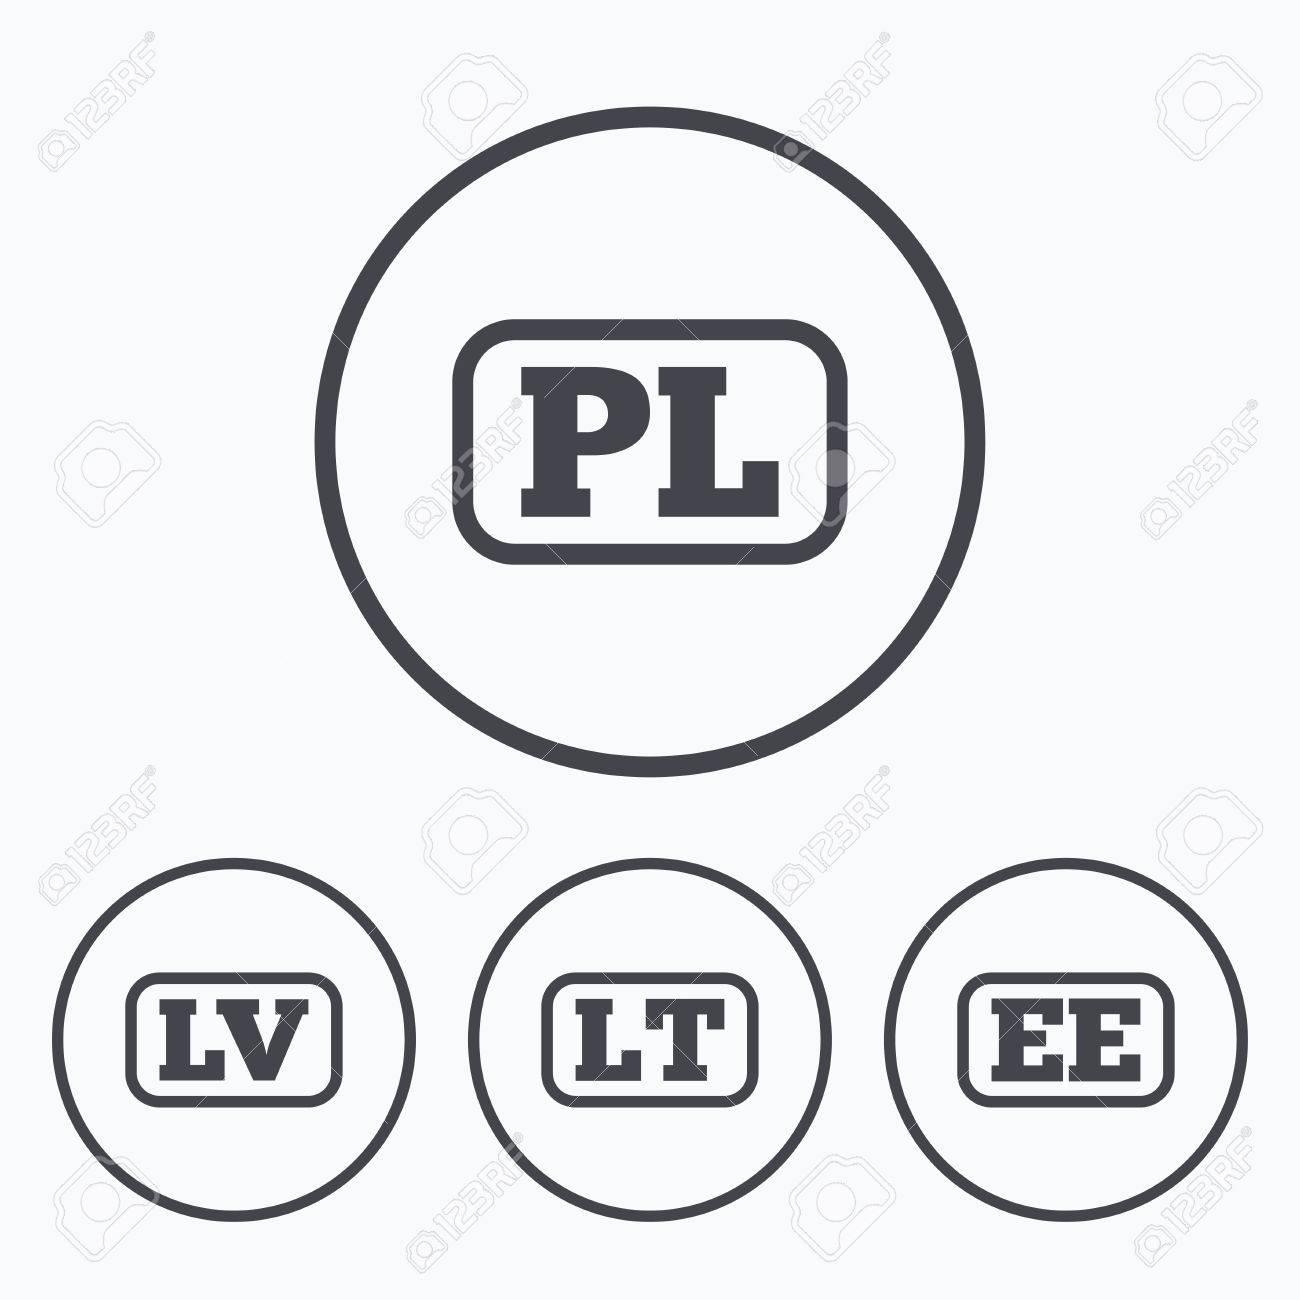 Language Icons. PL, LV, LT And EE Translation Symbols. Poland ...